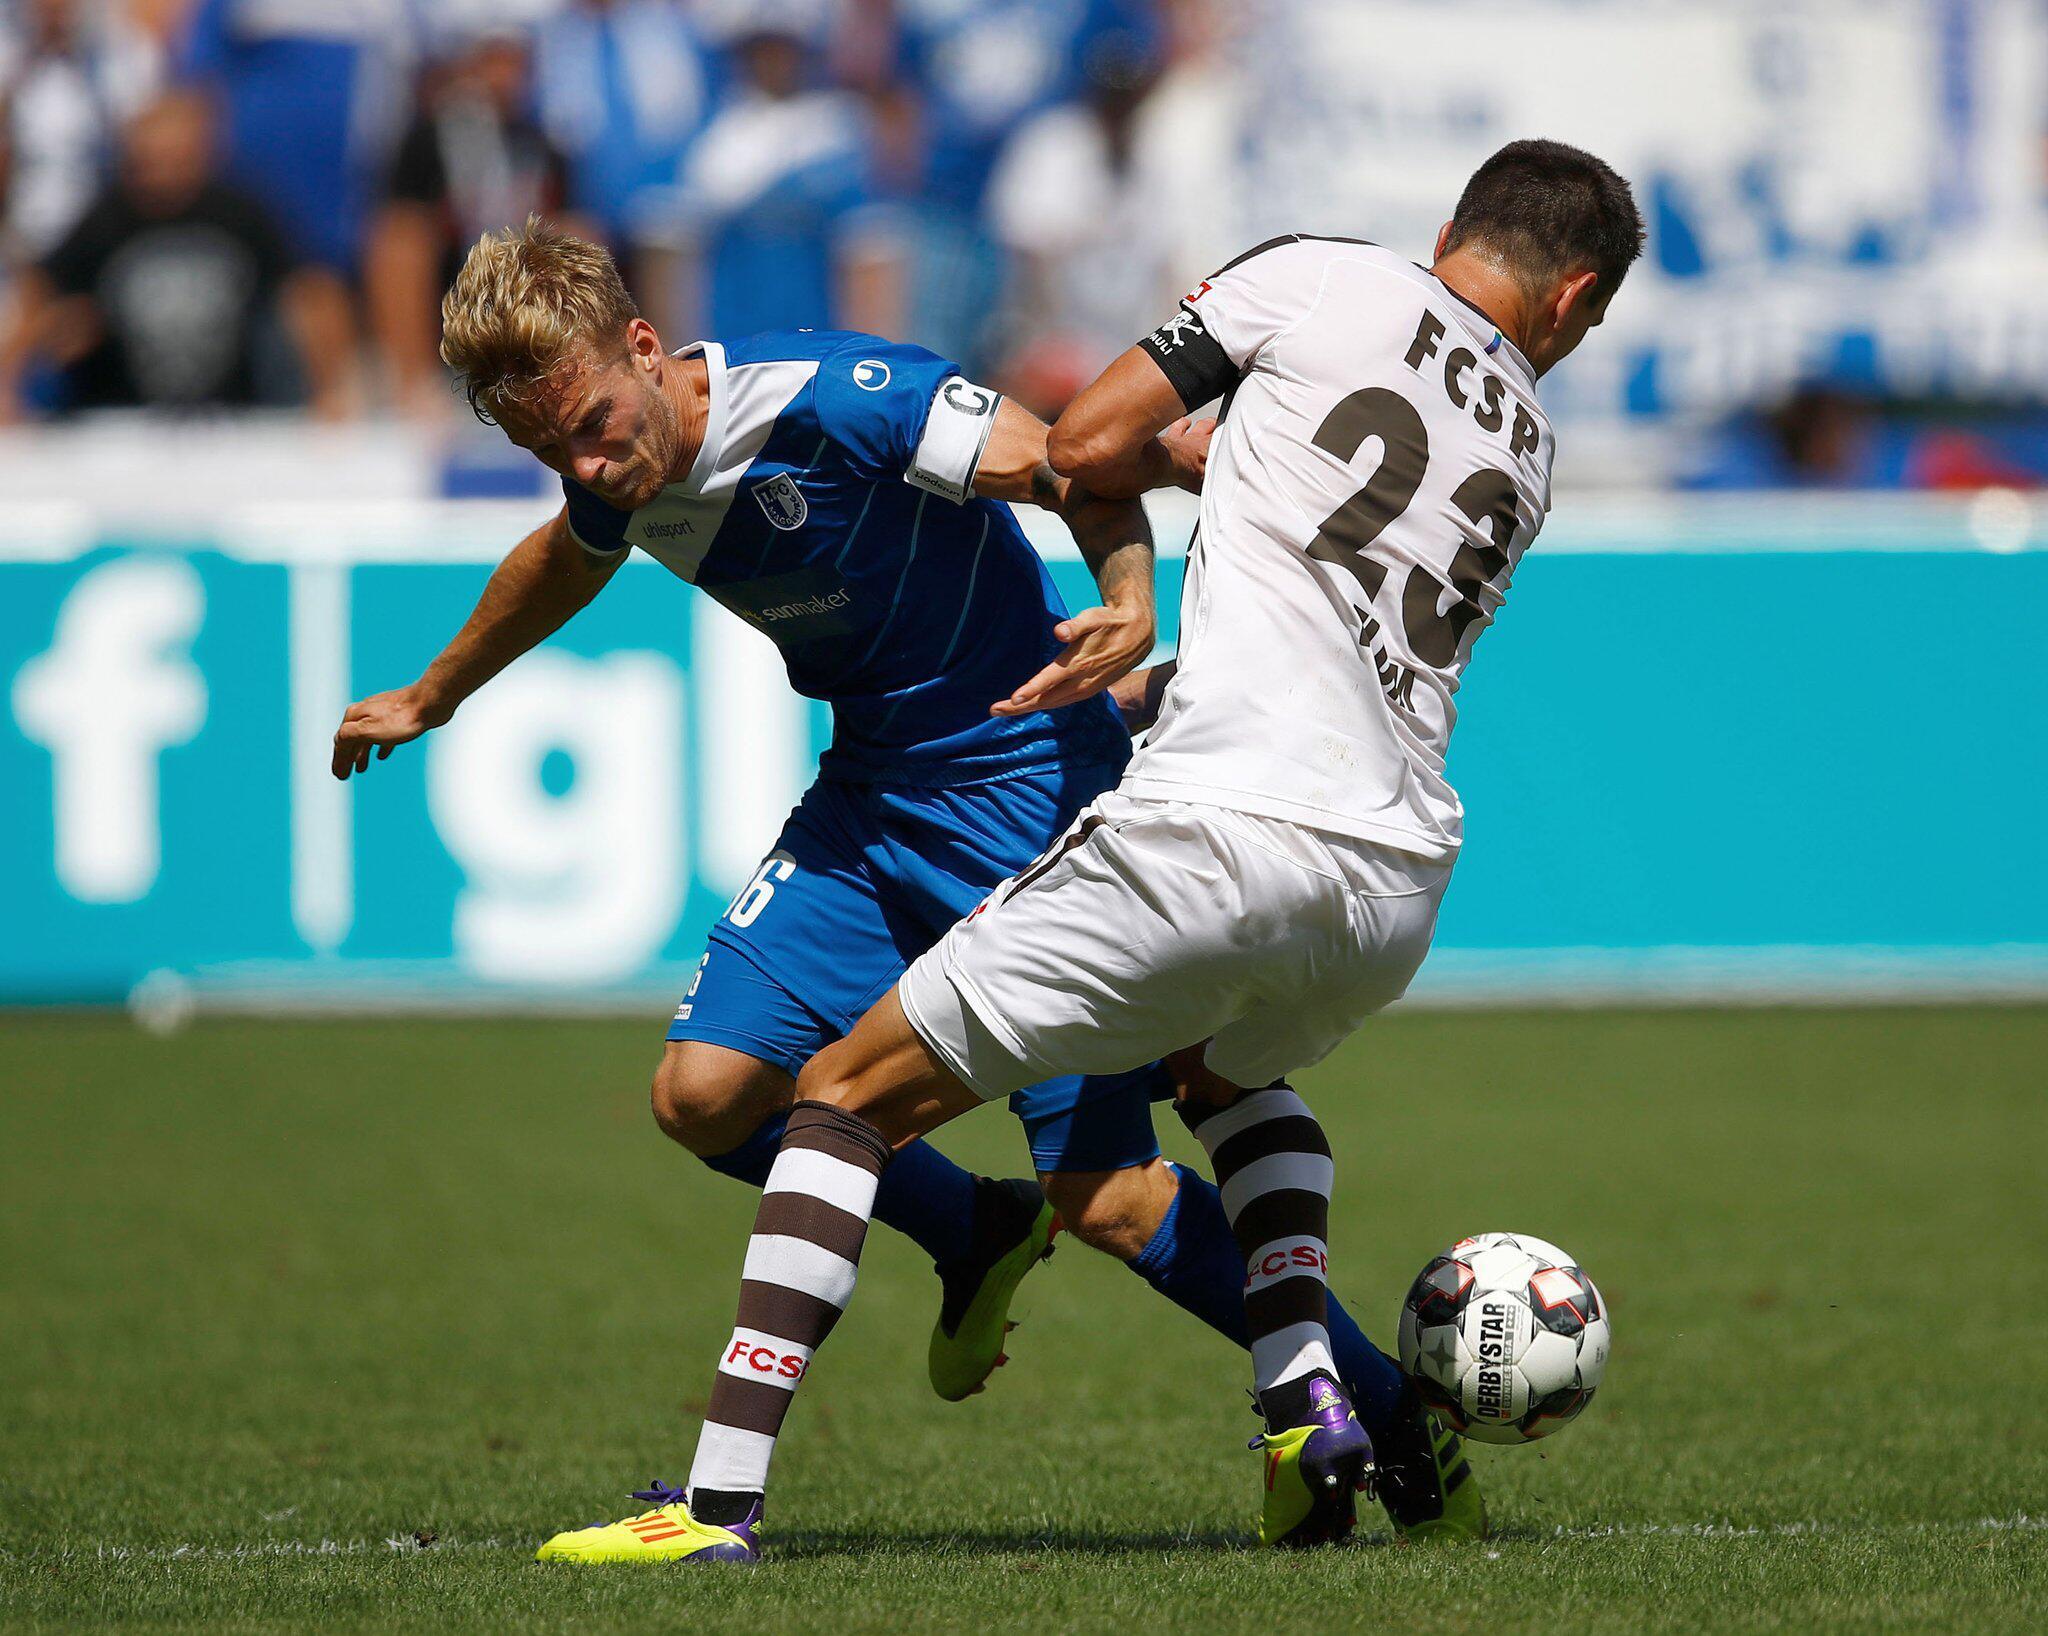 Bild zu 1. FC Magdeburg - FC St. Pauli